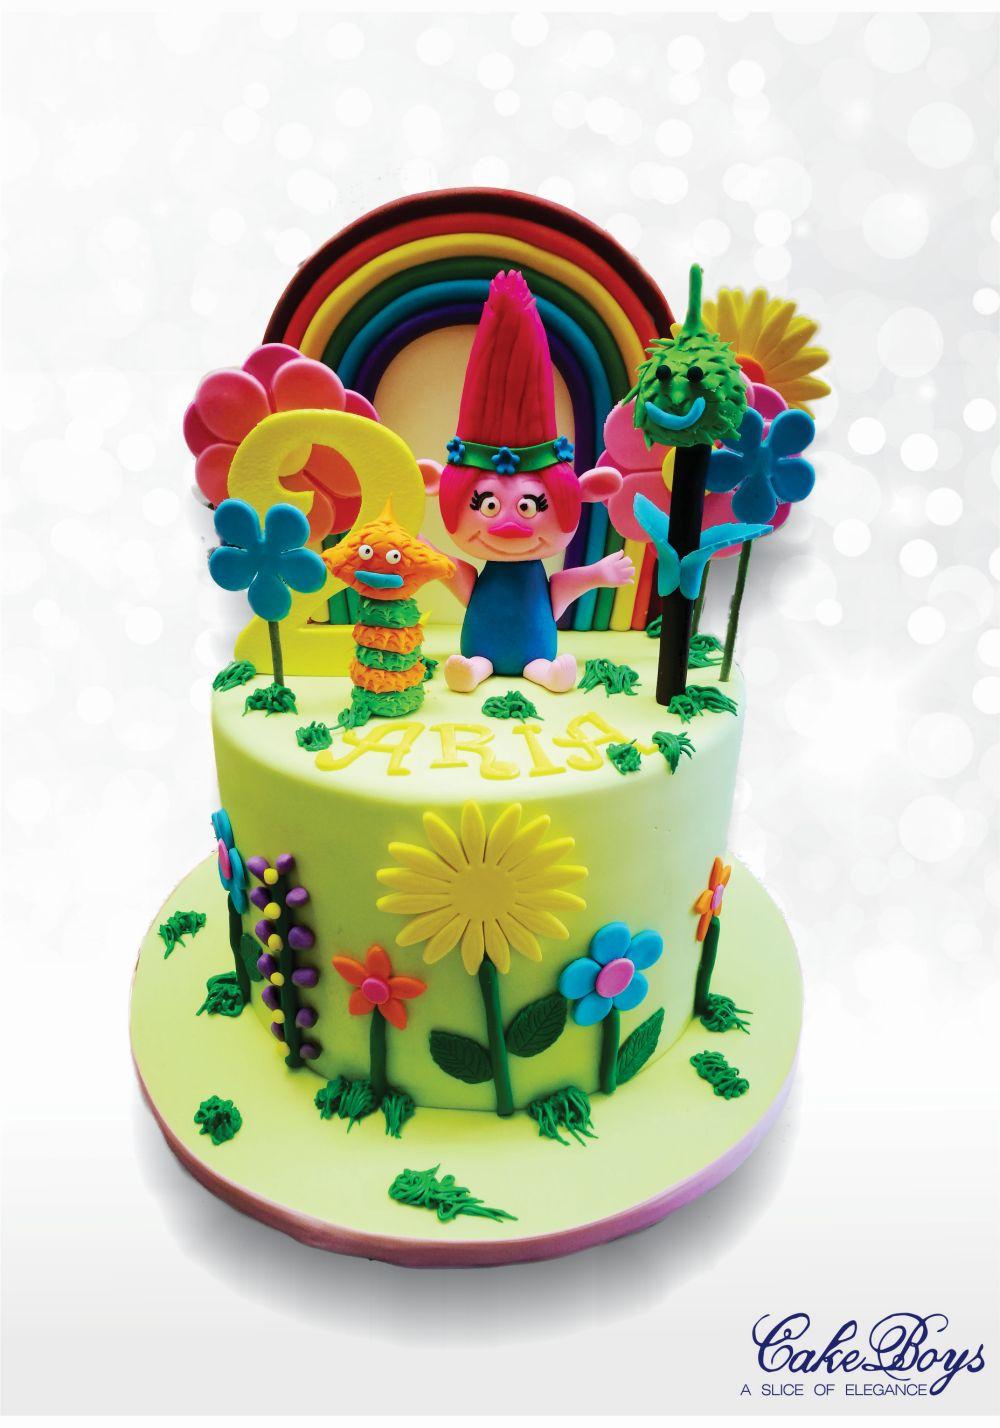 Birthday Cakes Cakeboys Cake Designers In Alberton Johannesburg Area